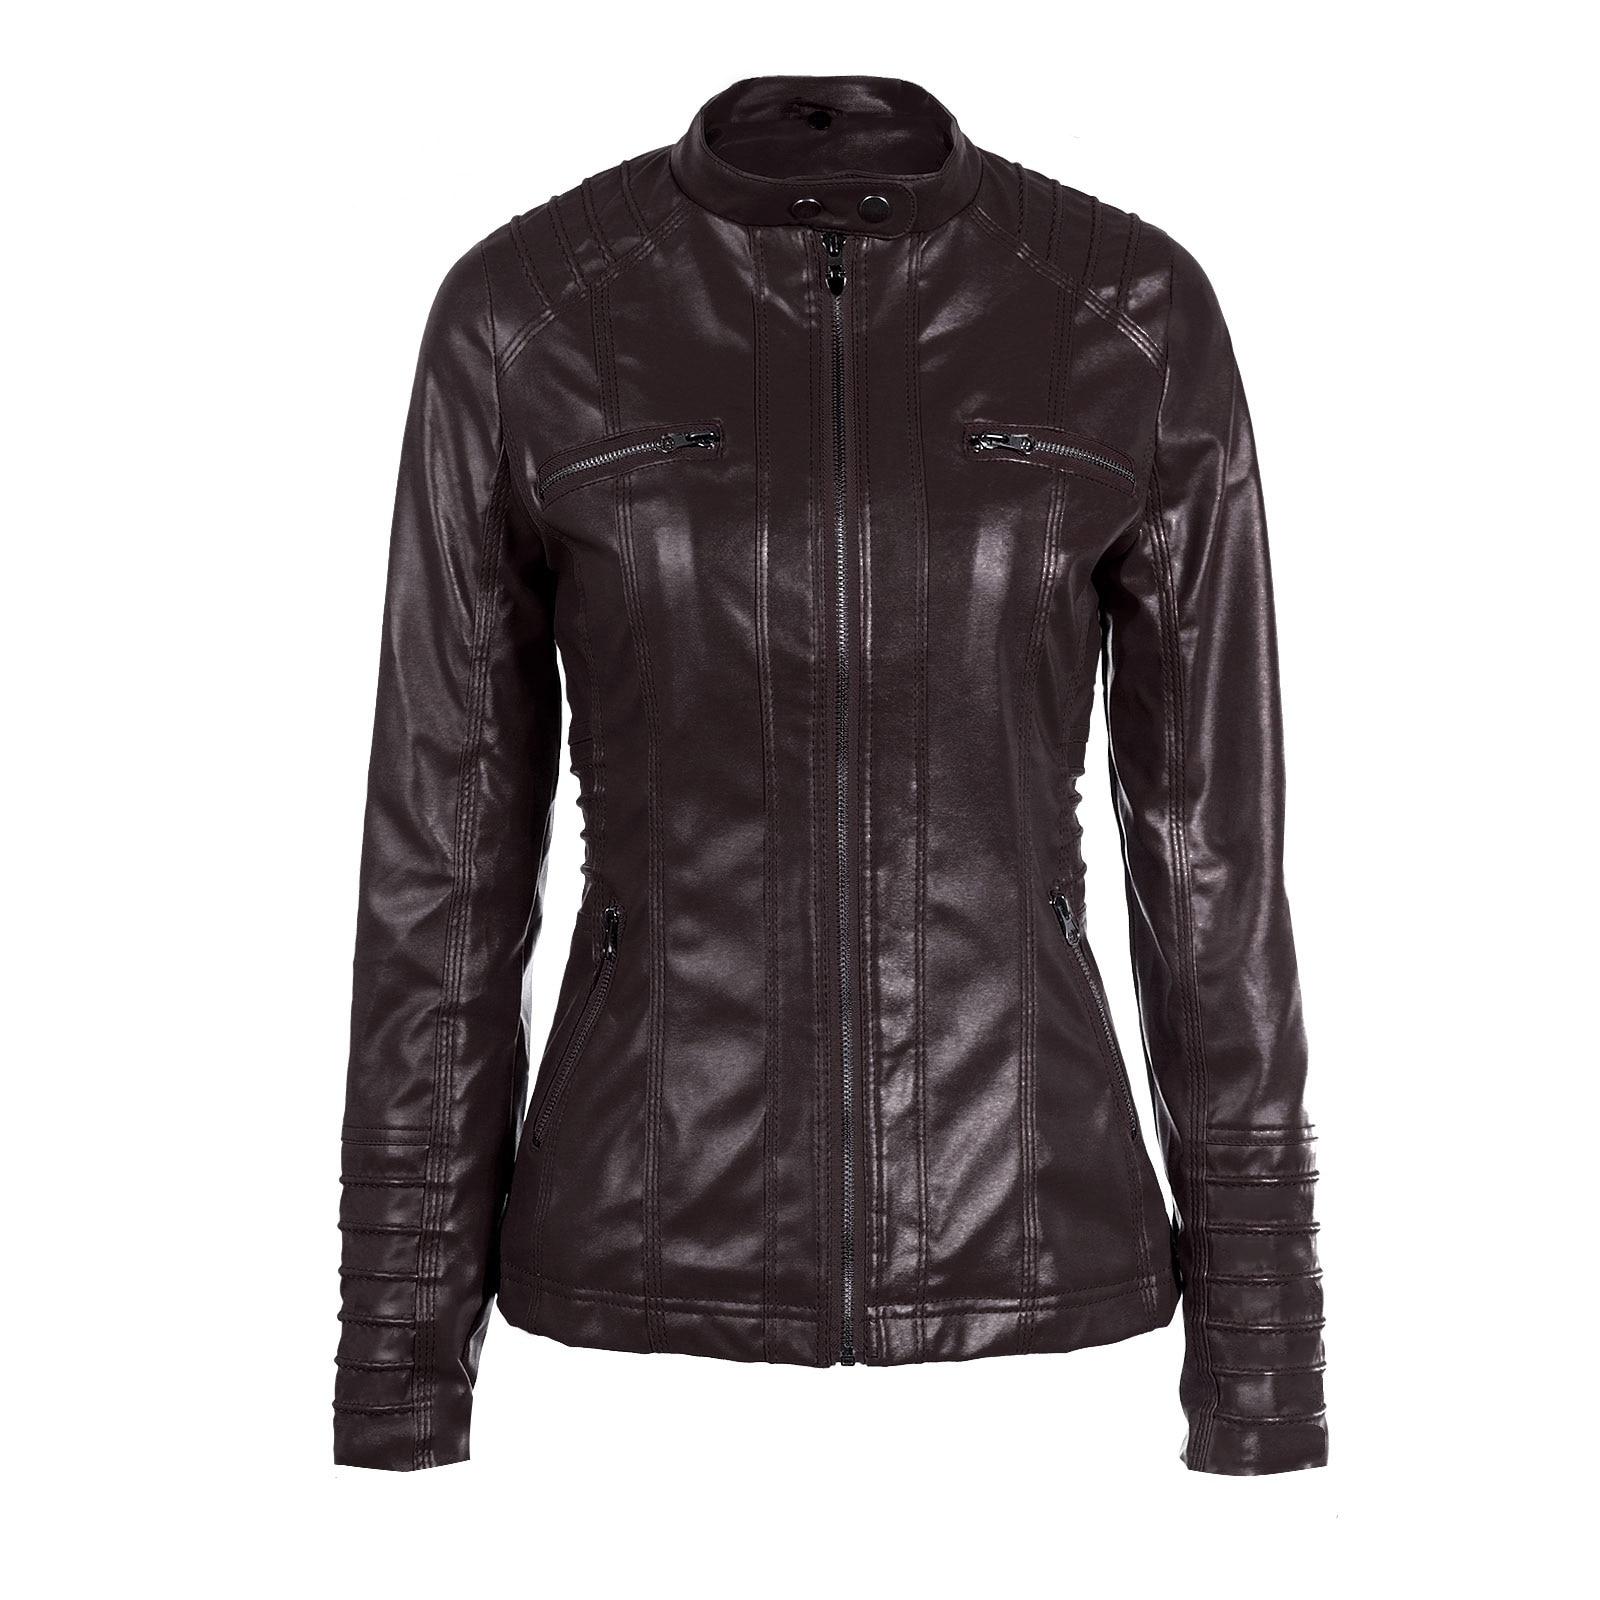 Riverdale Southside Riverdale Serpents black Brown PU Leather Jacket Women Riverdale Serpents Streetwear Leather Brand Coat 17